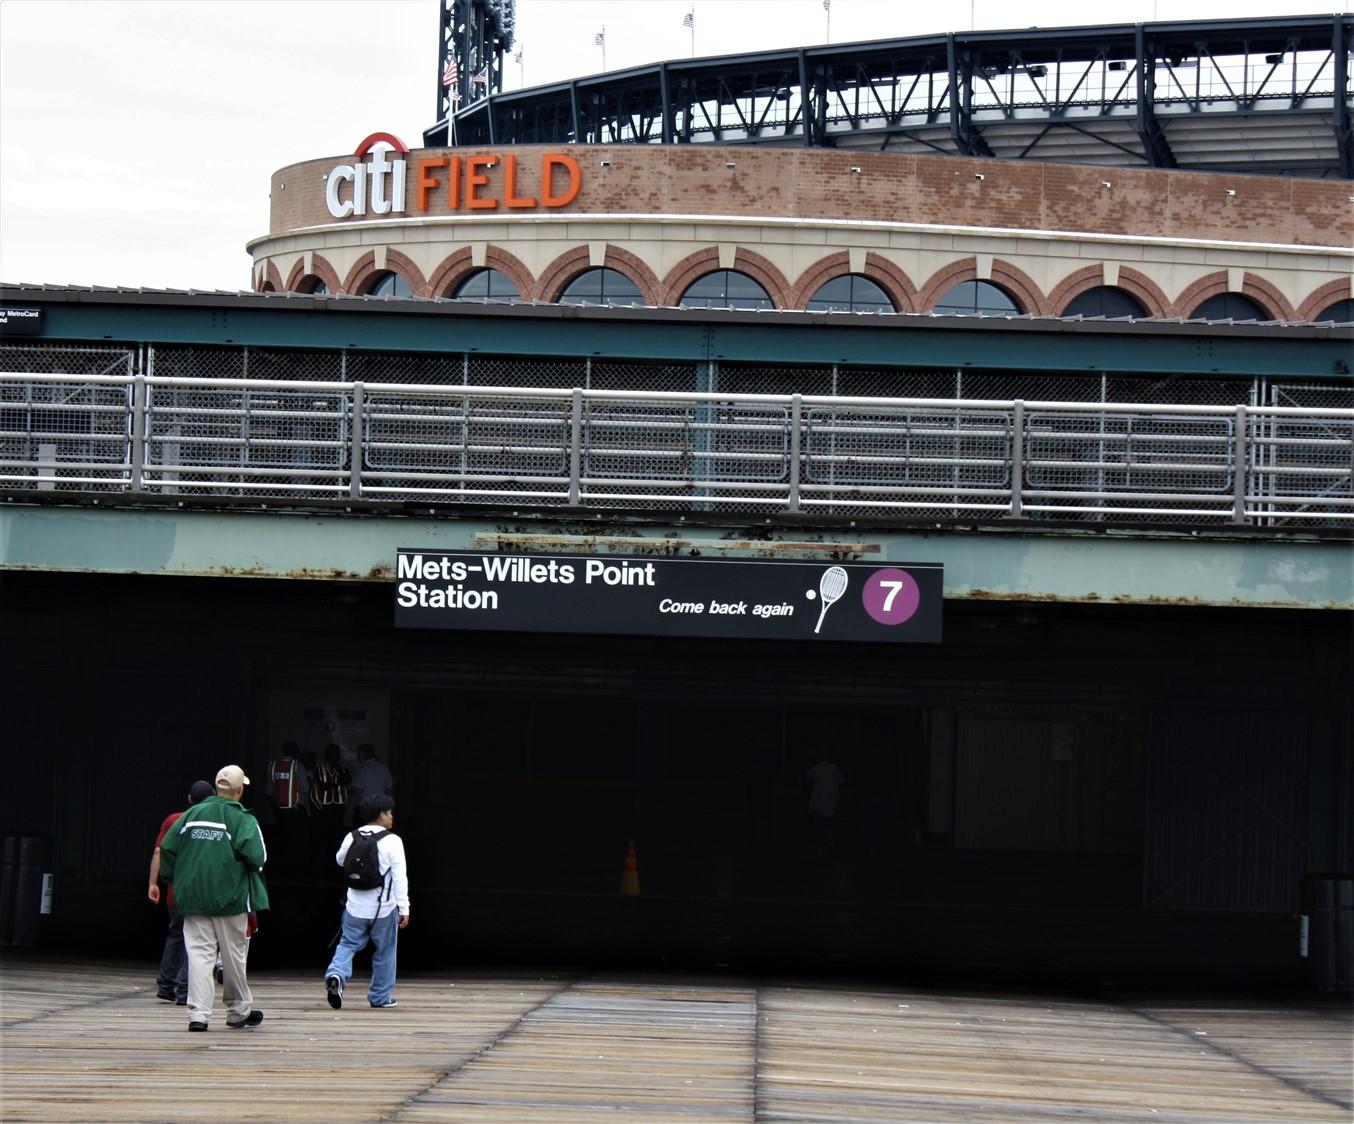 2009 06 21 Law School Road Trip Day 6 New York Mets 32.jpg